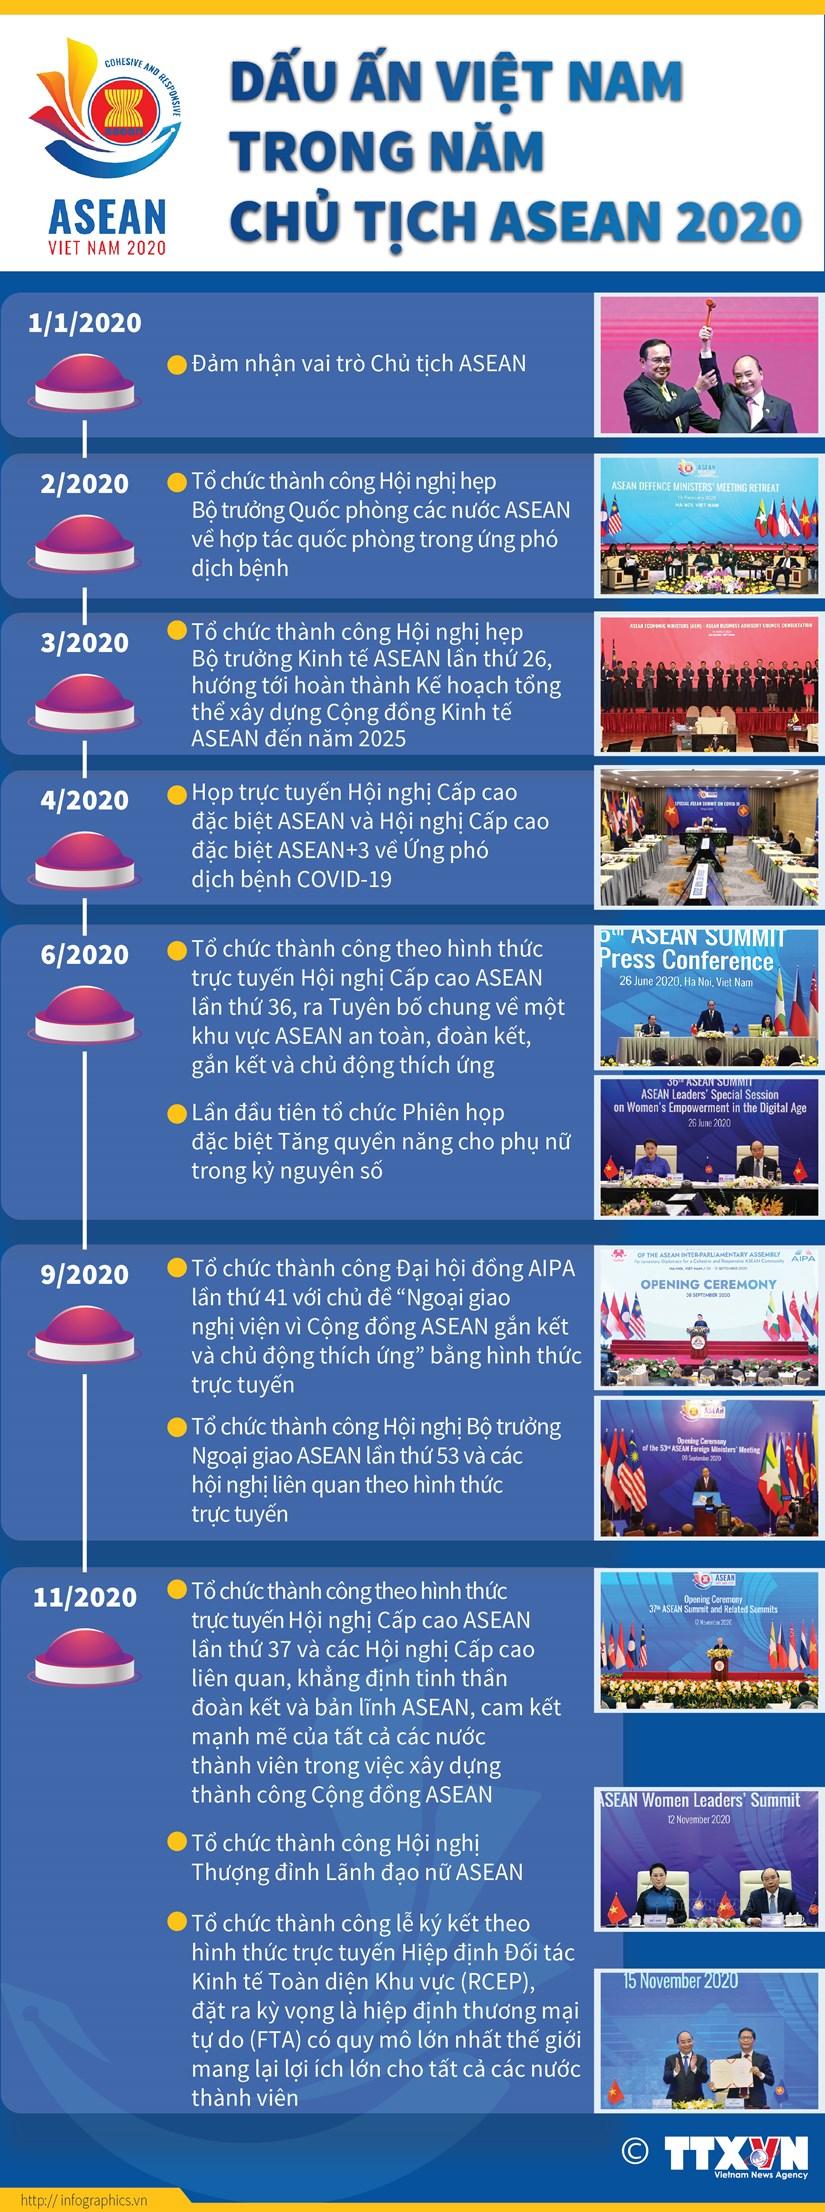 [Infographics] Dau an Viet Nam trong Nam Chu tich ASEAN 2020 hinh anh 1